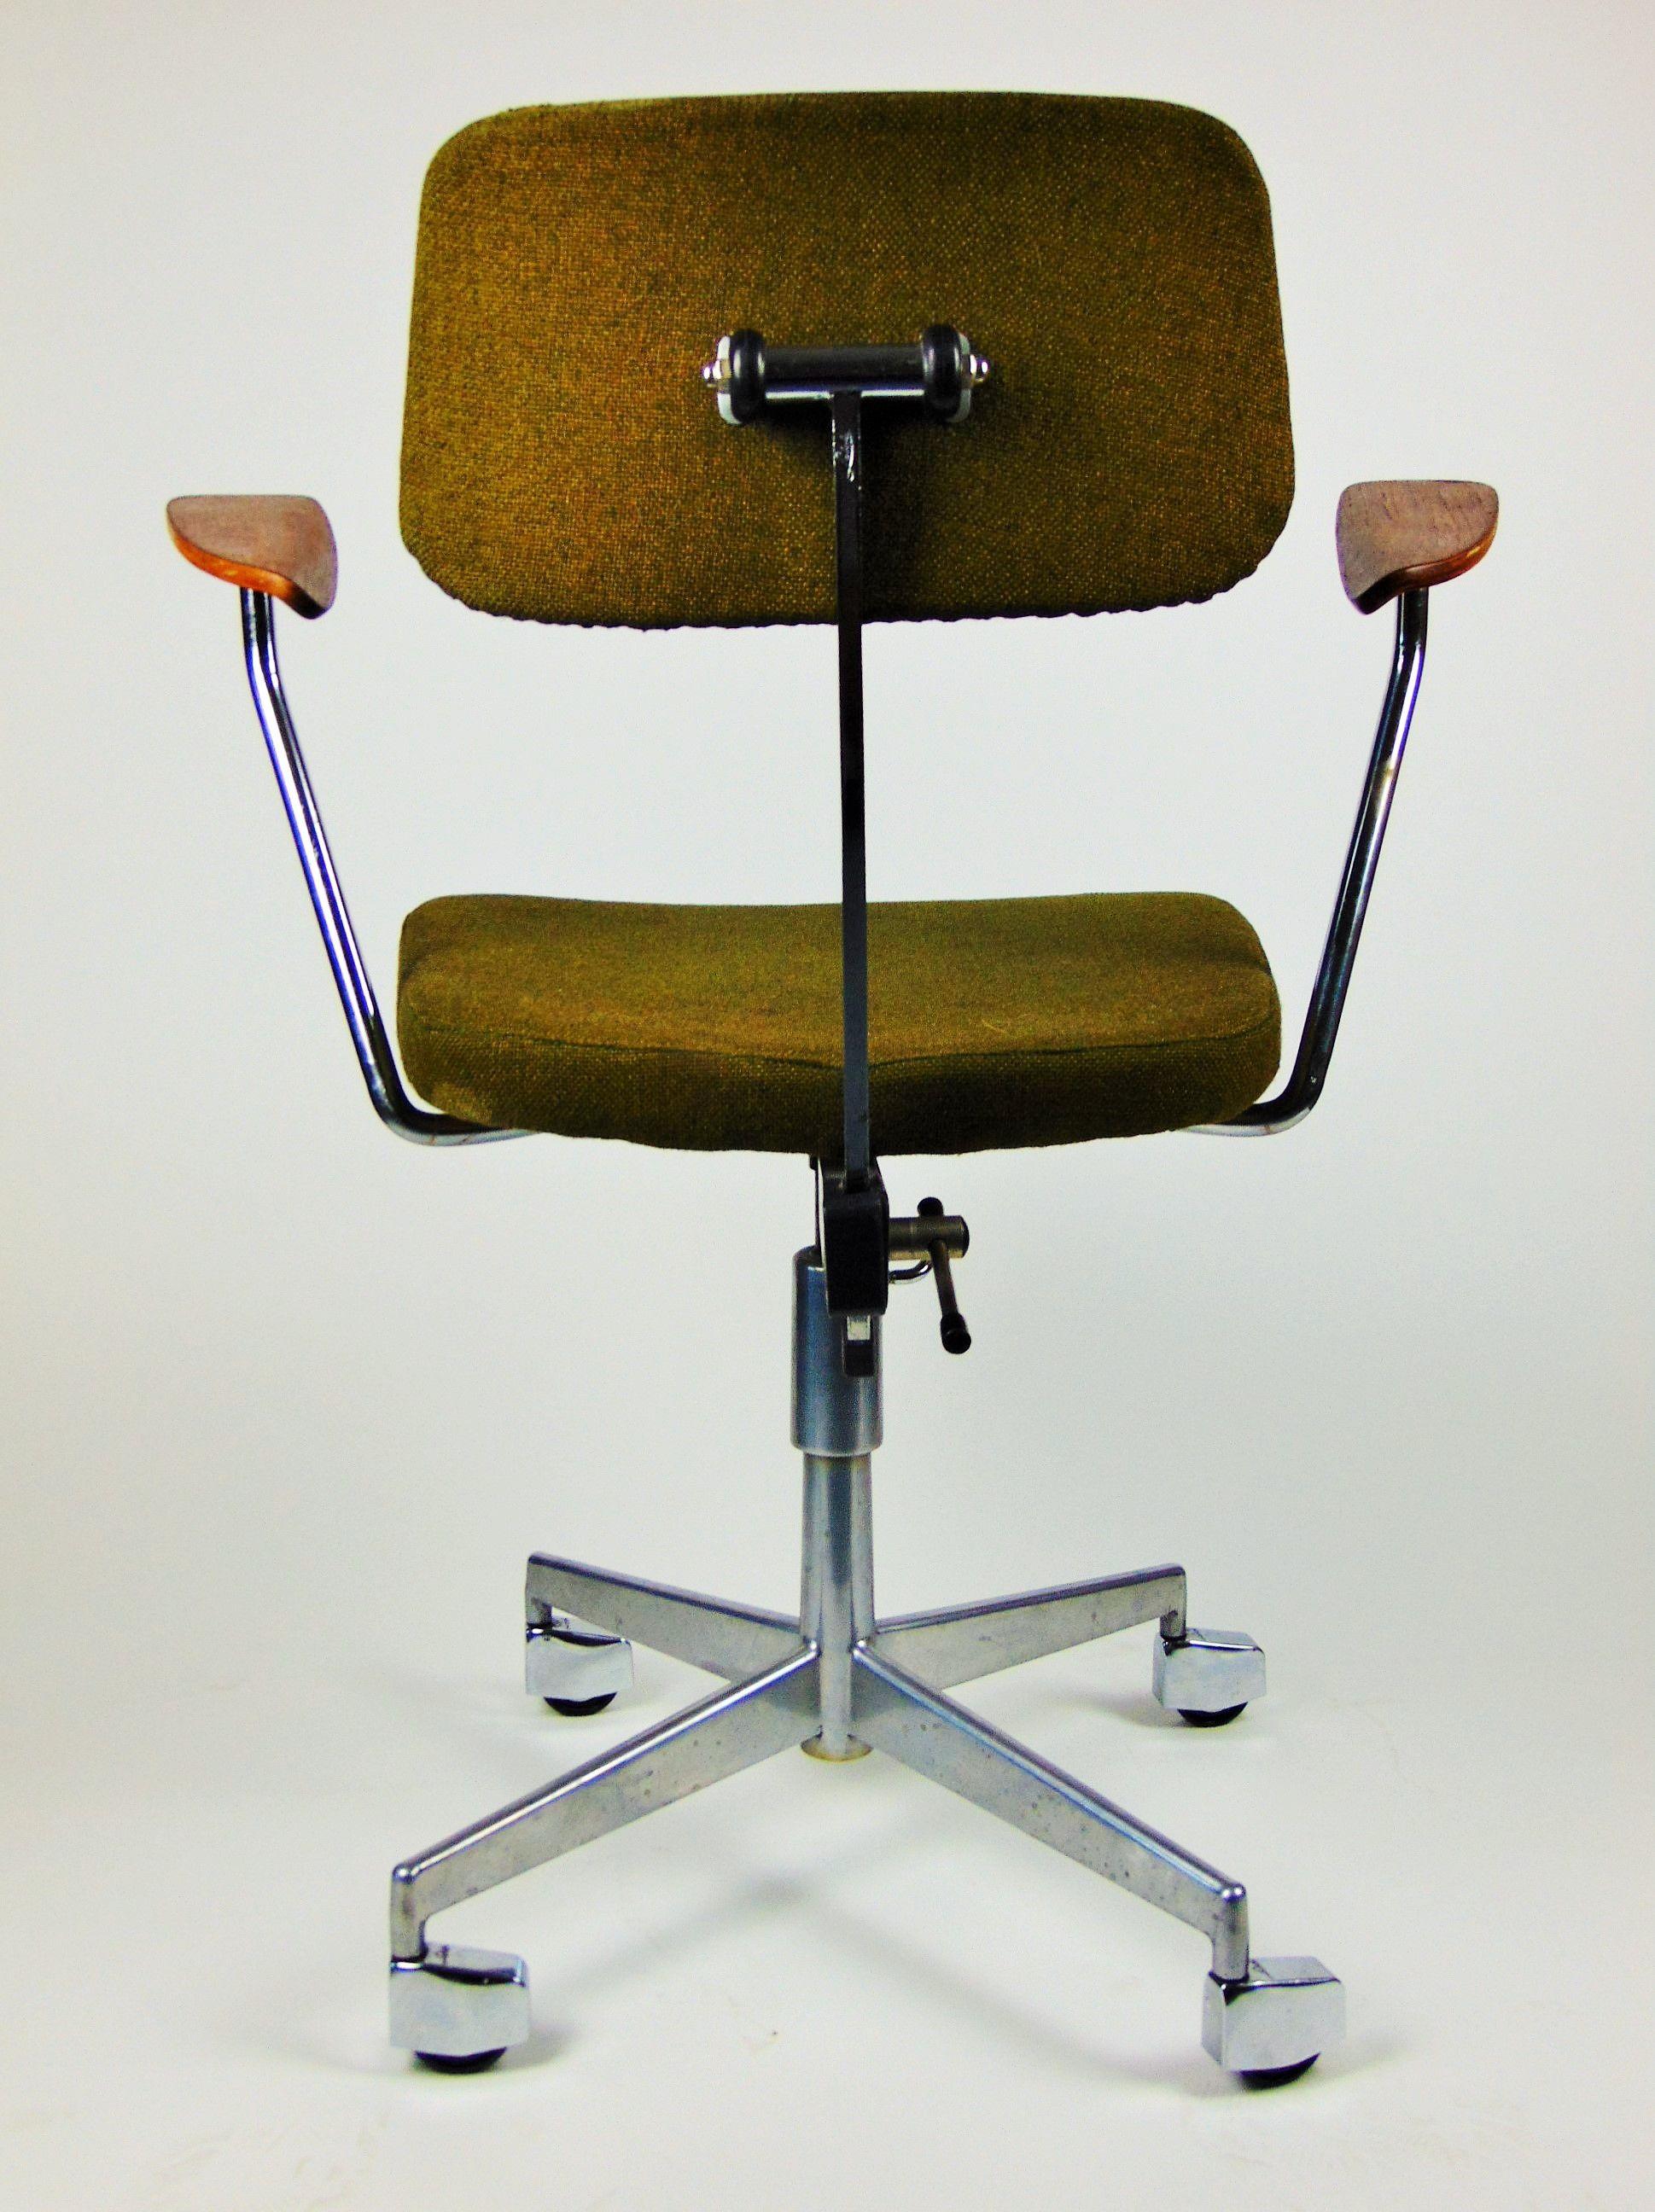 Labofa office chair 1968 Danmark